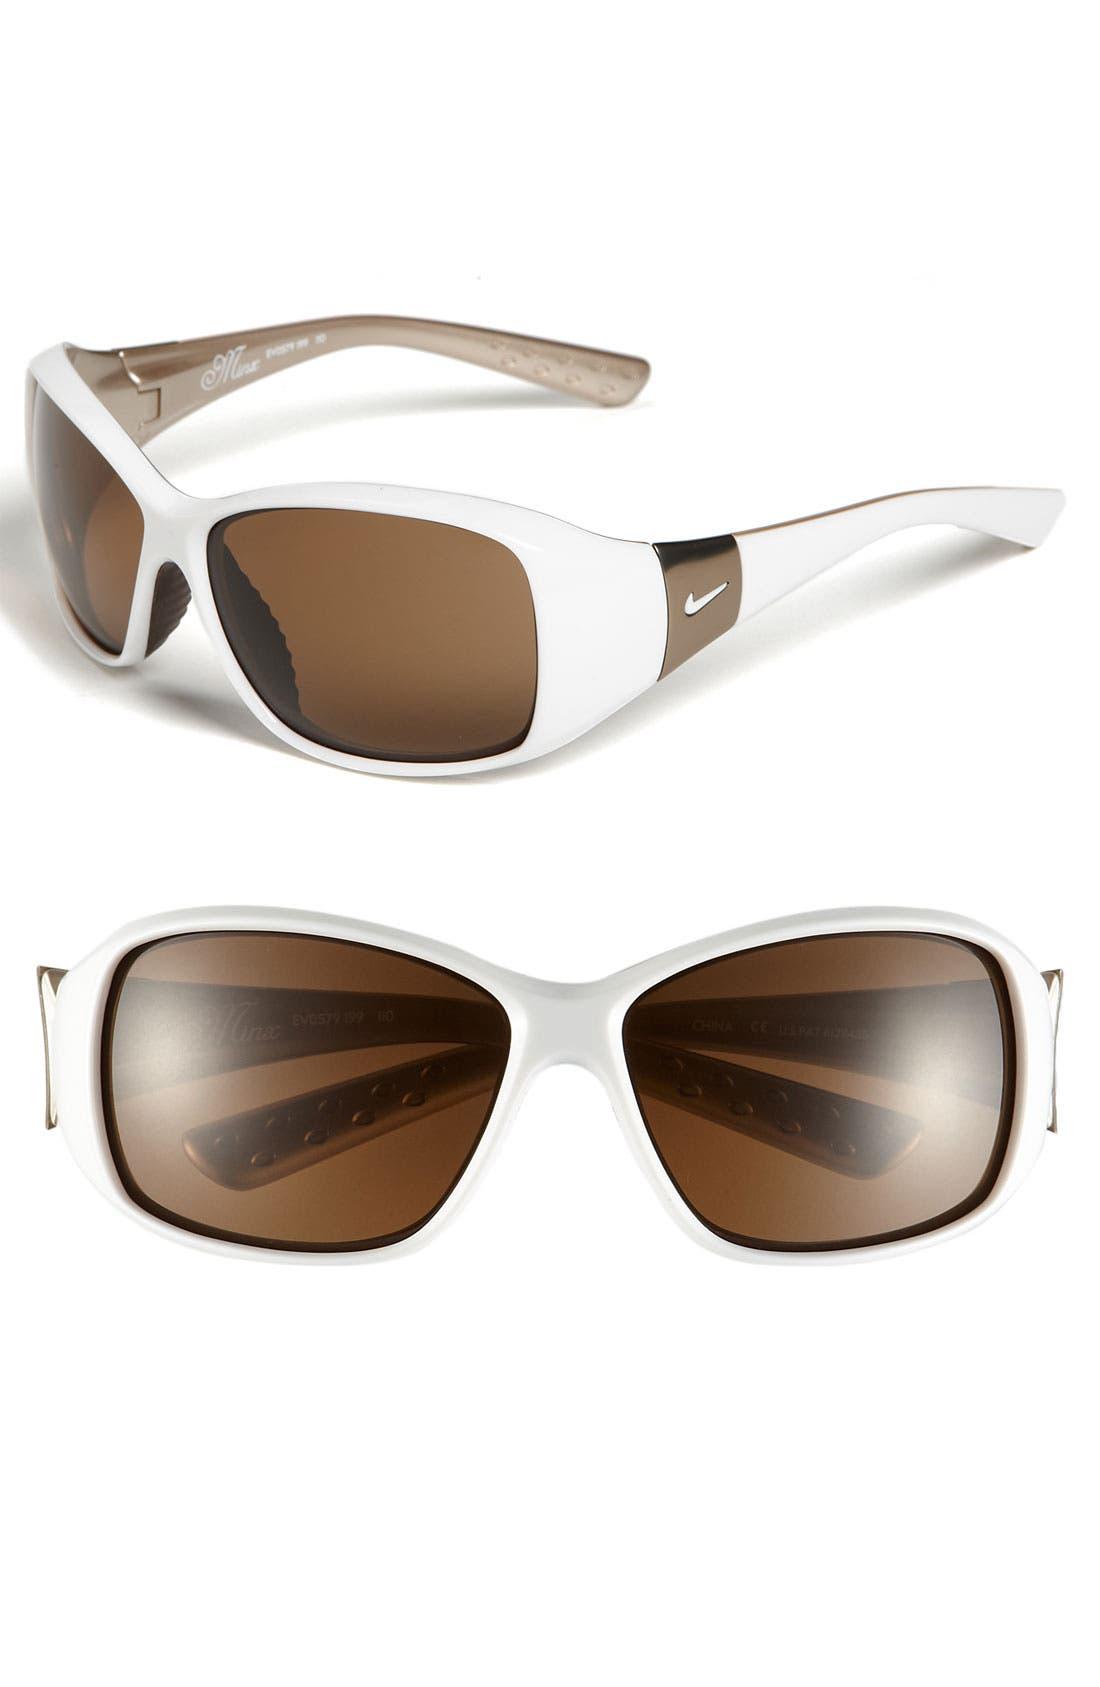 Main Image - Nike 'Minx' 59mm Sunglasses